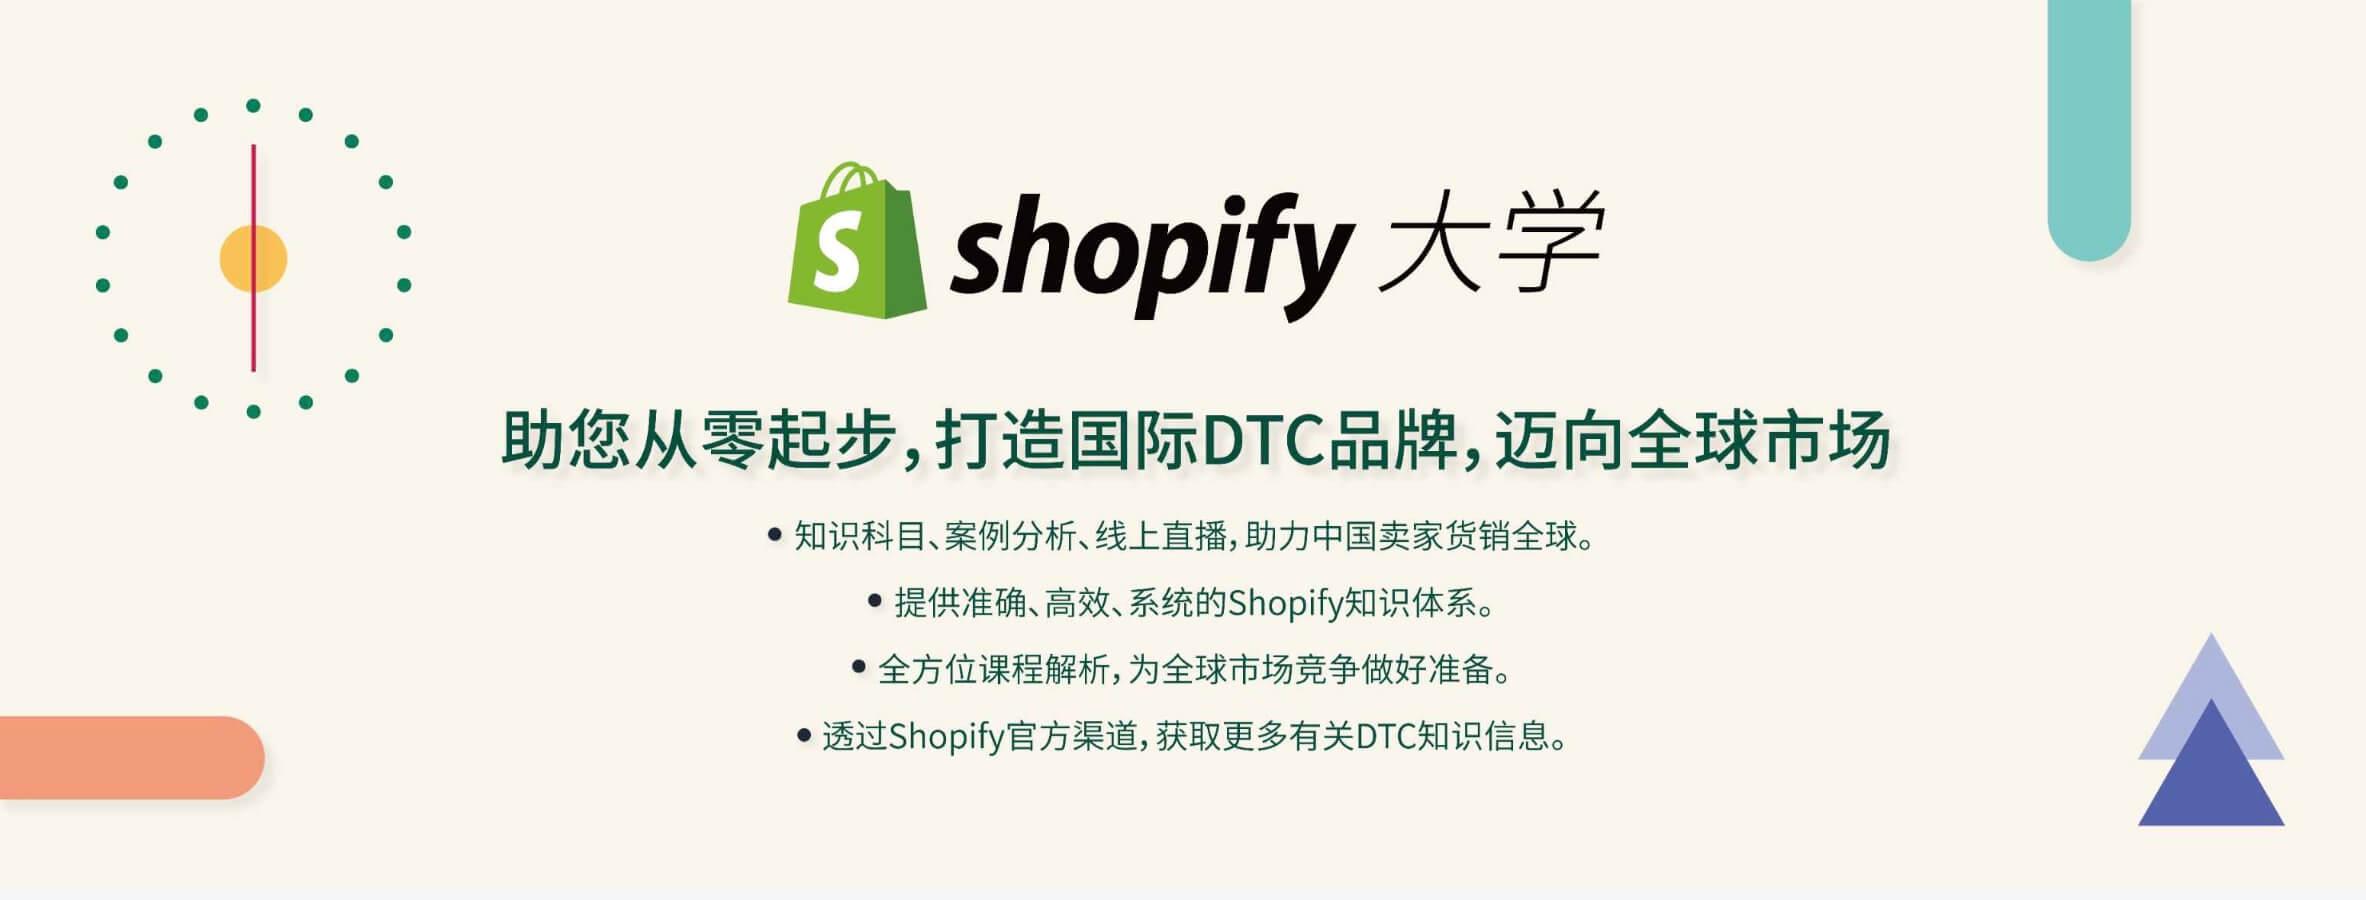 Shopify大学